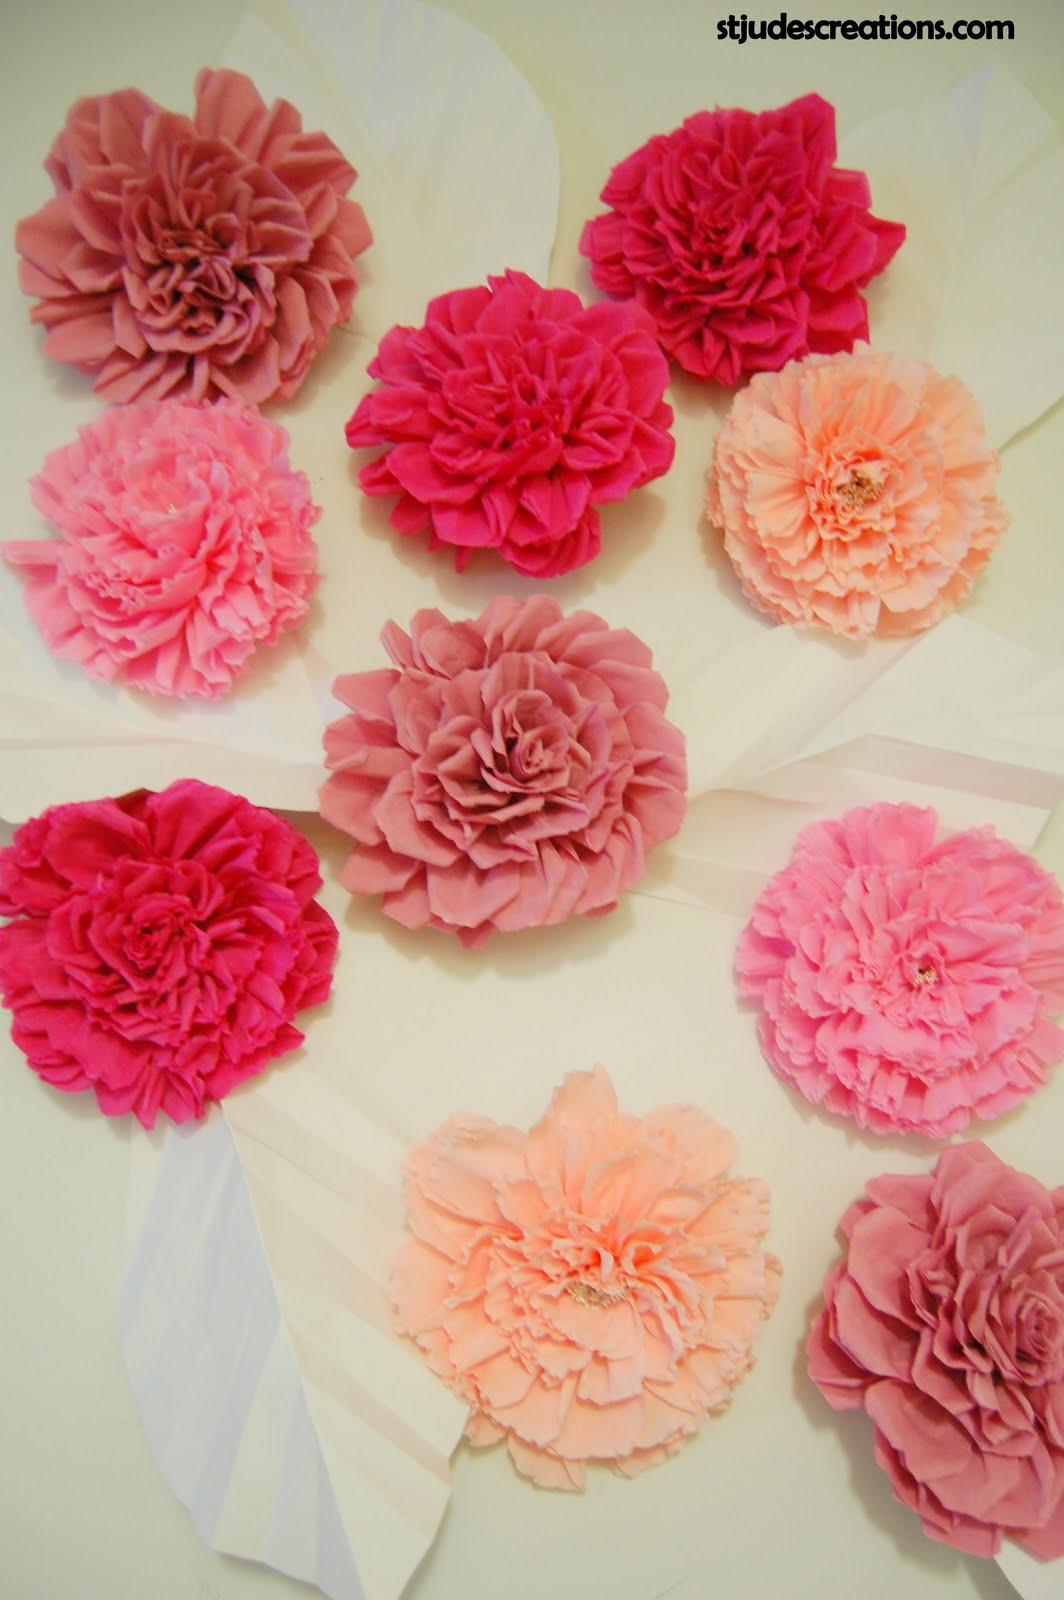 Essay on Flowers : Description & Information